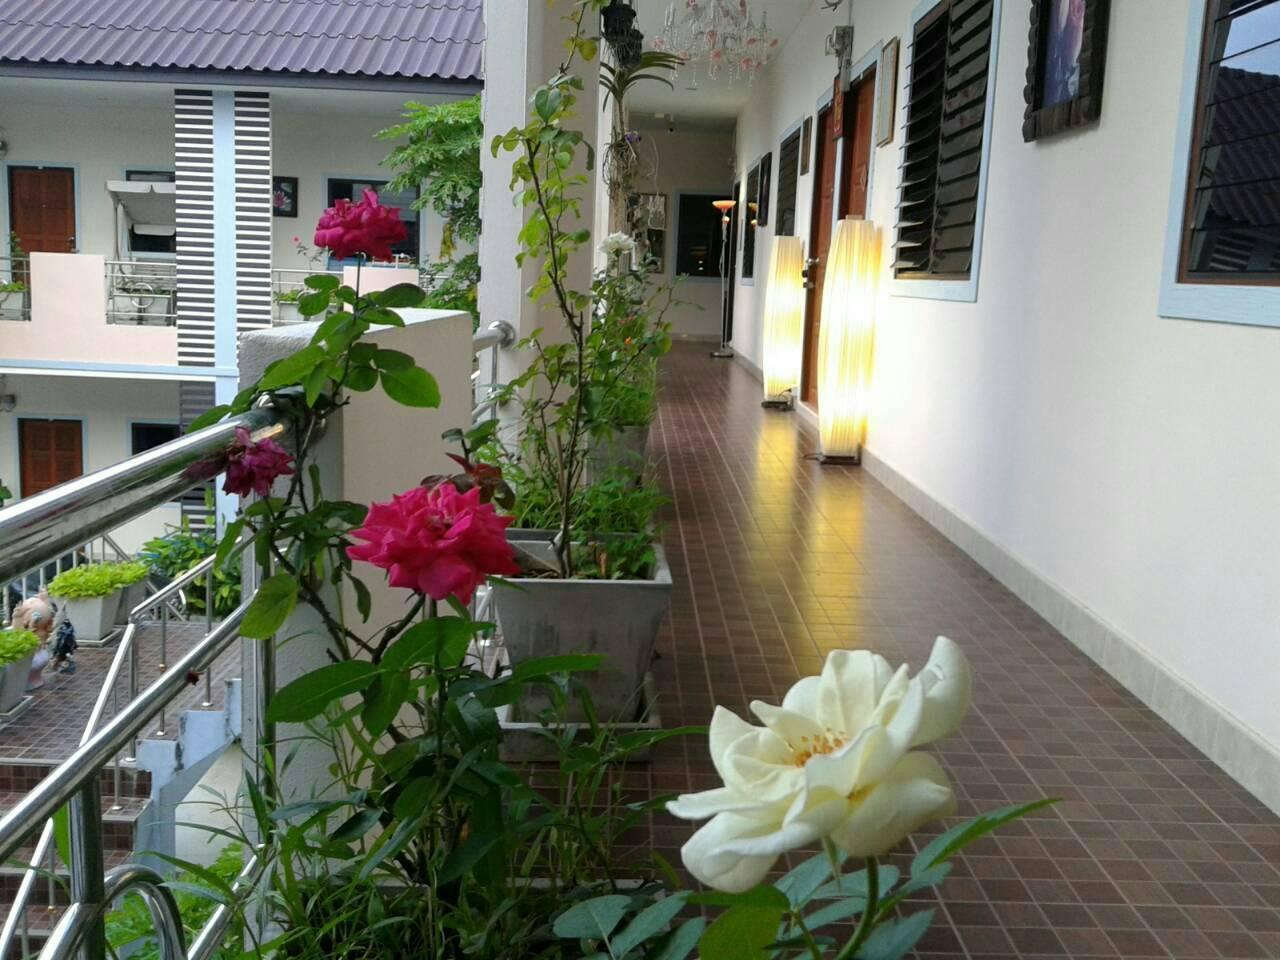 Ban Suan Kularb Surat Thani AirCon Room 1 สตูดิโอ อพาร์ตเมนต์ 1 ห้องน้ำส่วนตัว ขนาด 30 ตร.ม. – ซิตี้เซ็นเตอร์